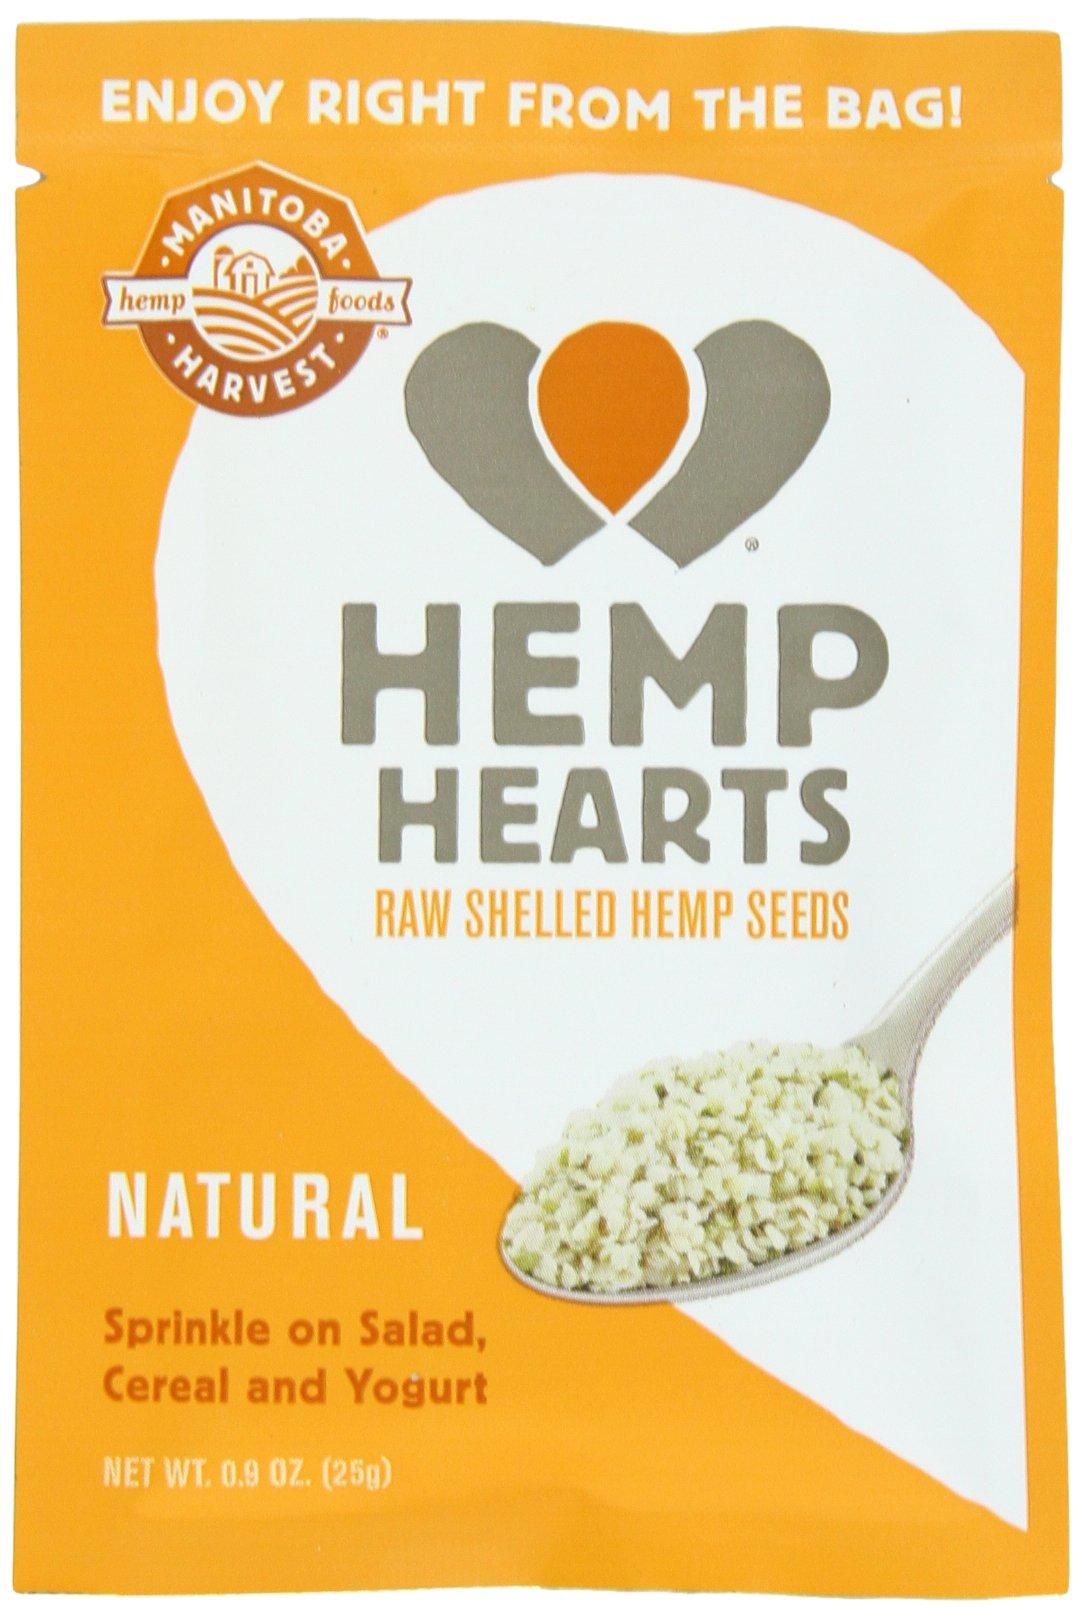 Manitoba Harvest Hemp Hearts Raw Shelled Hemp Seeds, 12 Single Serve Packets